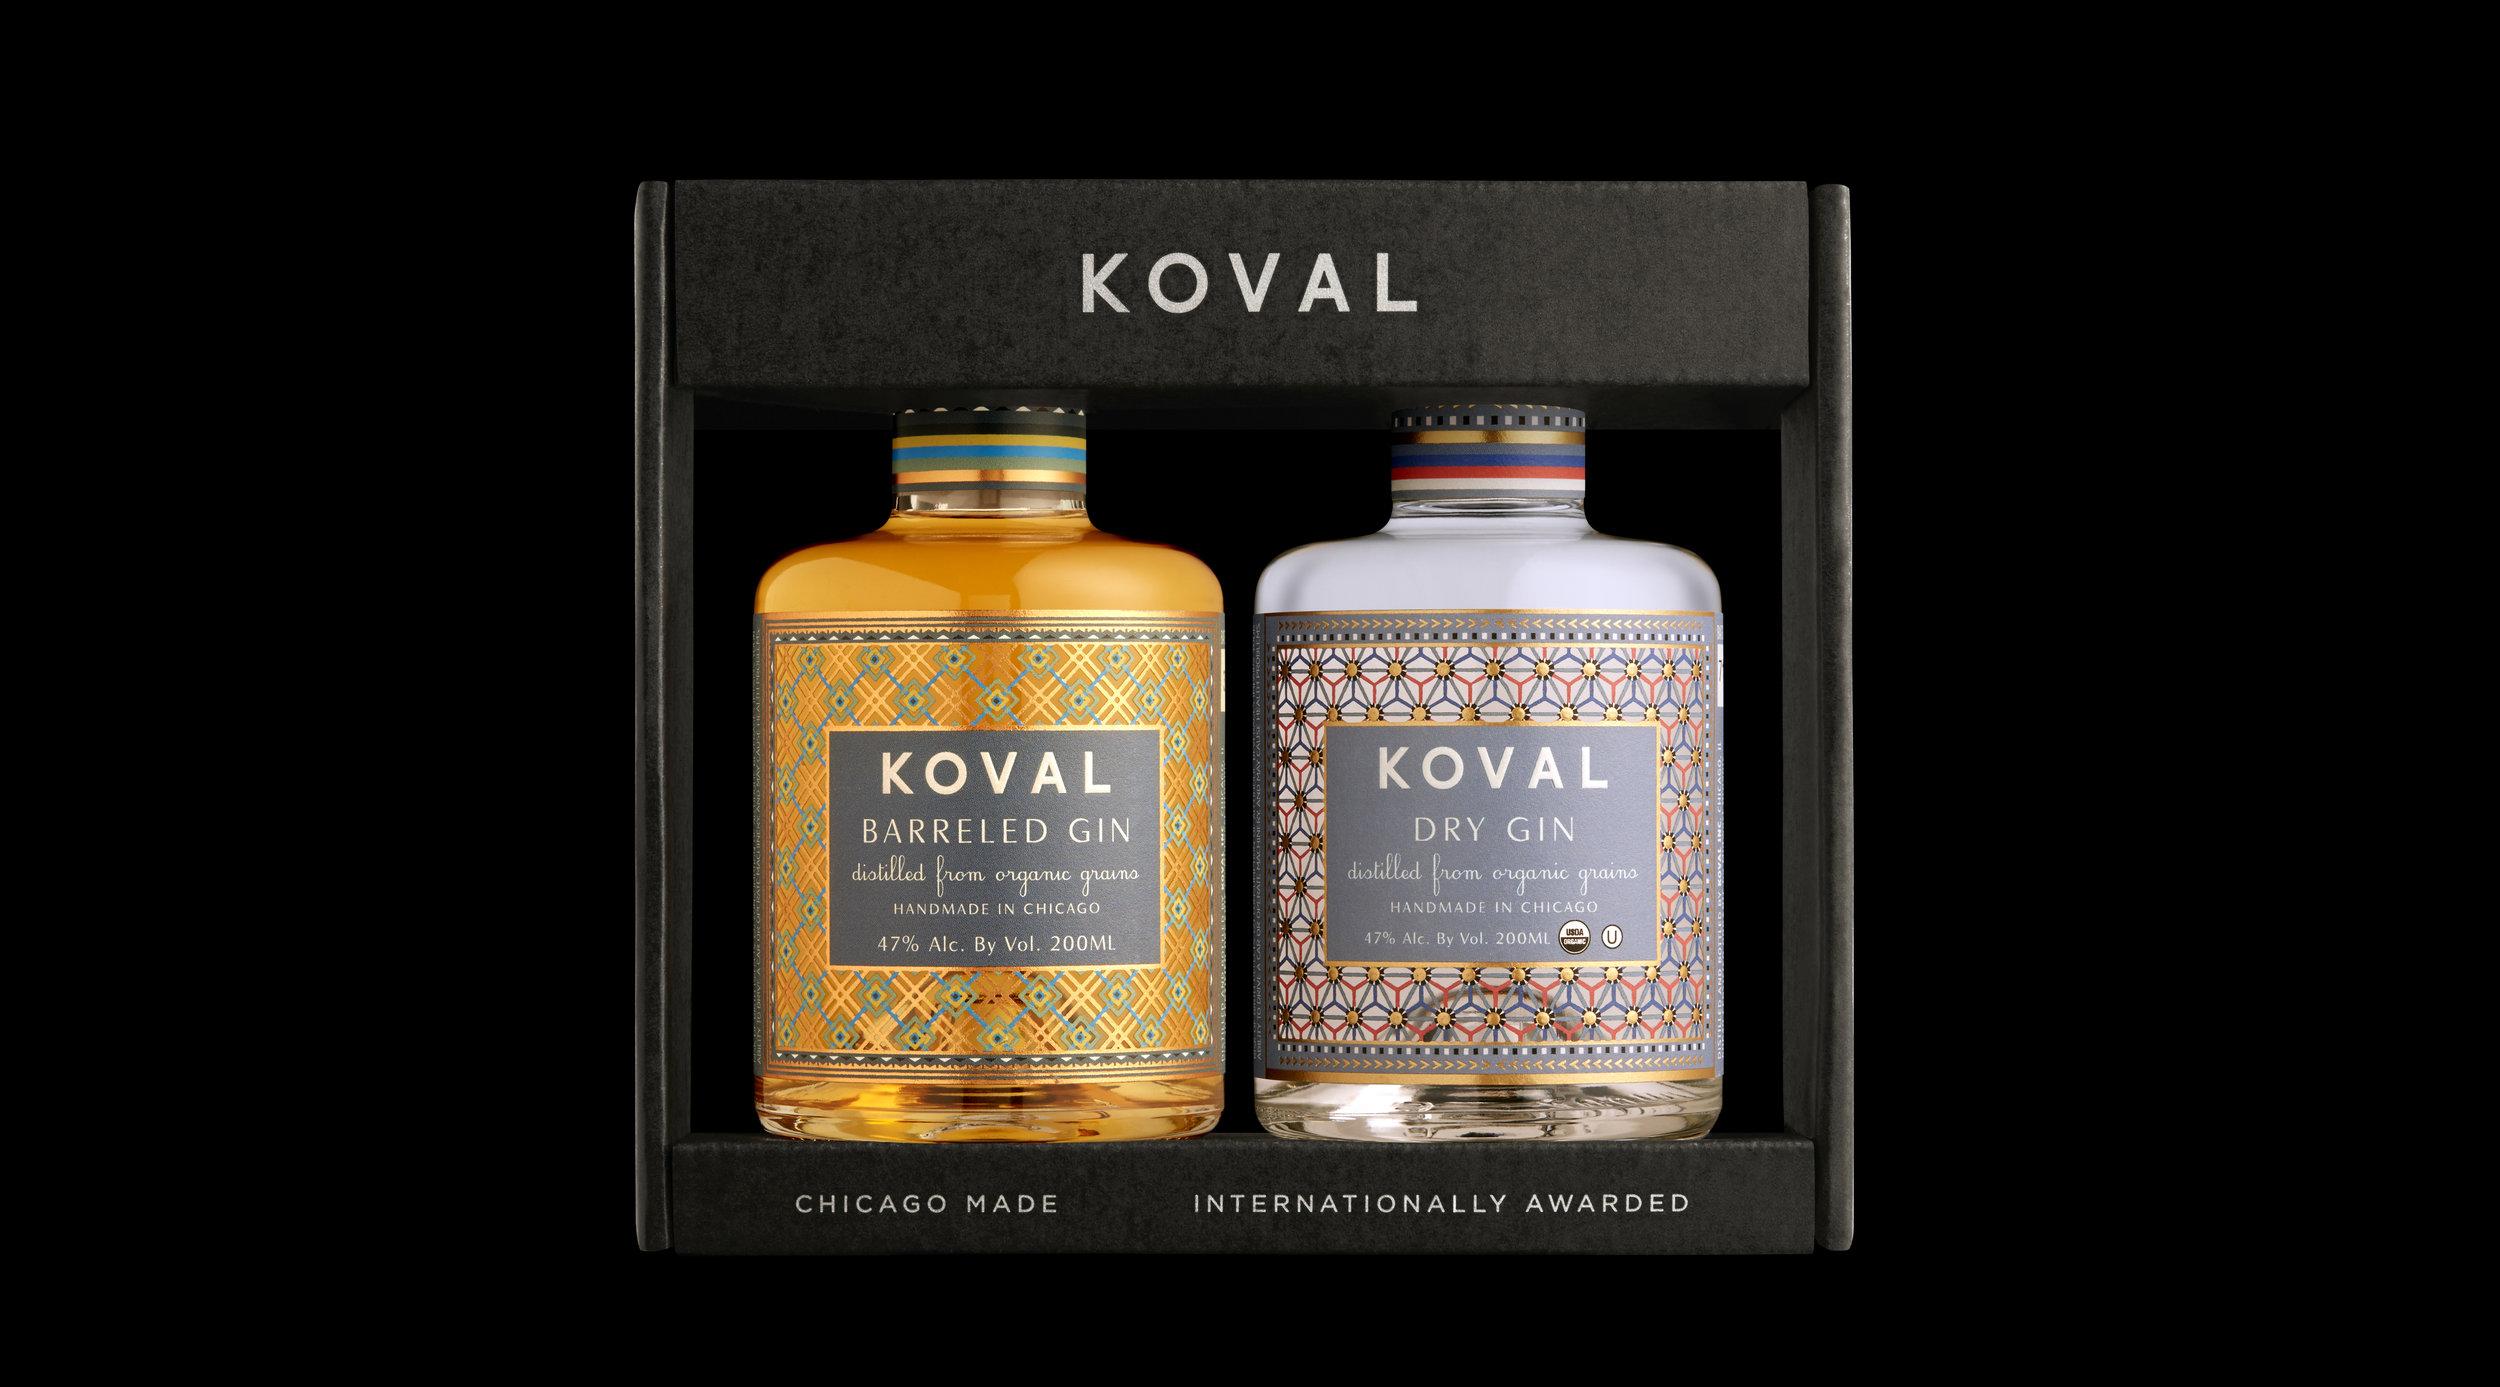 Koval_Gin_giftbox_black_F_V2.jpg